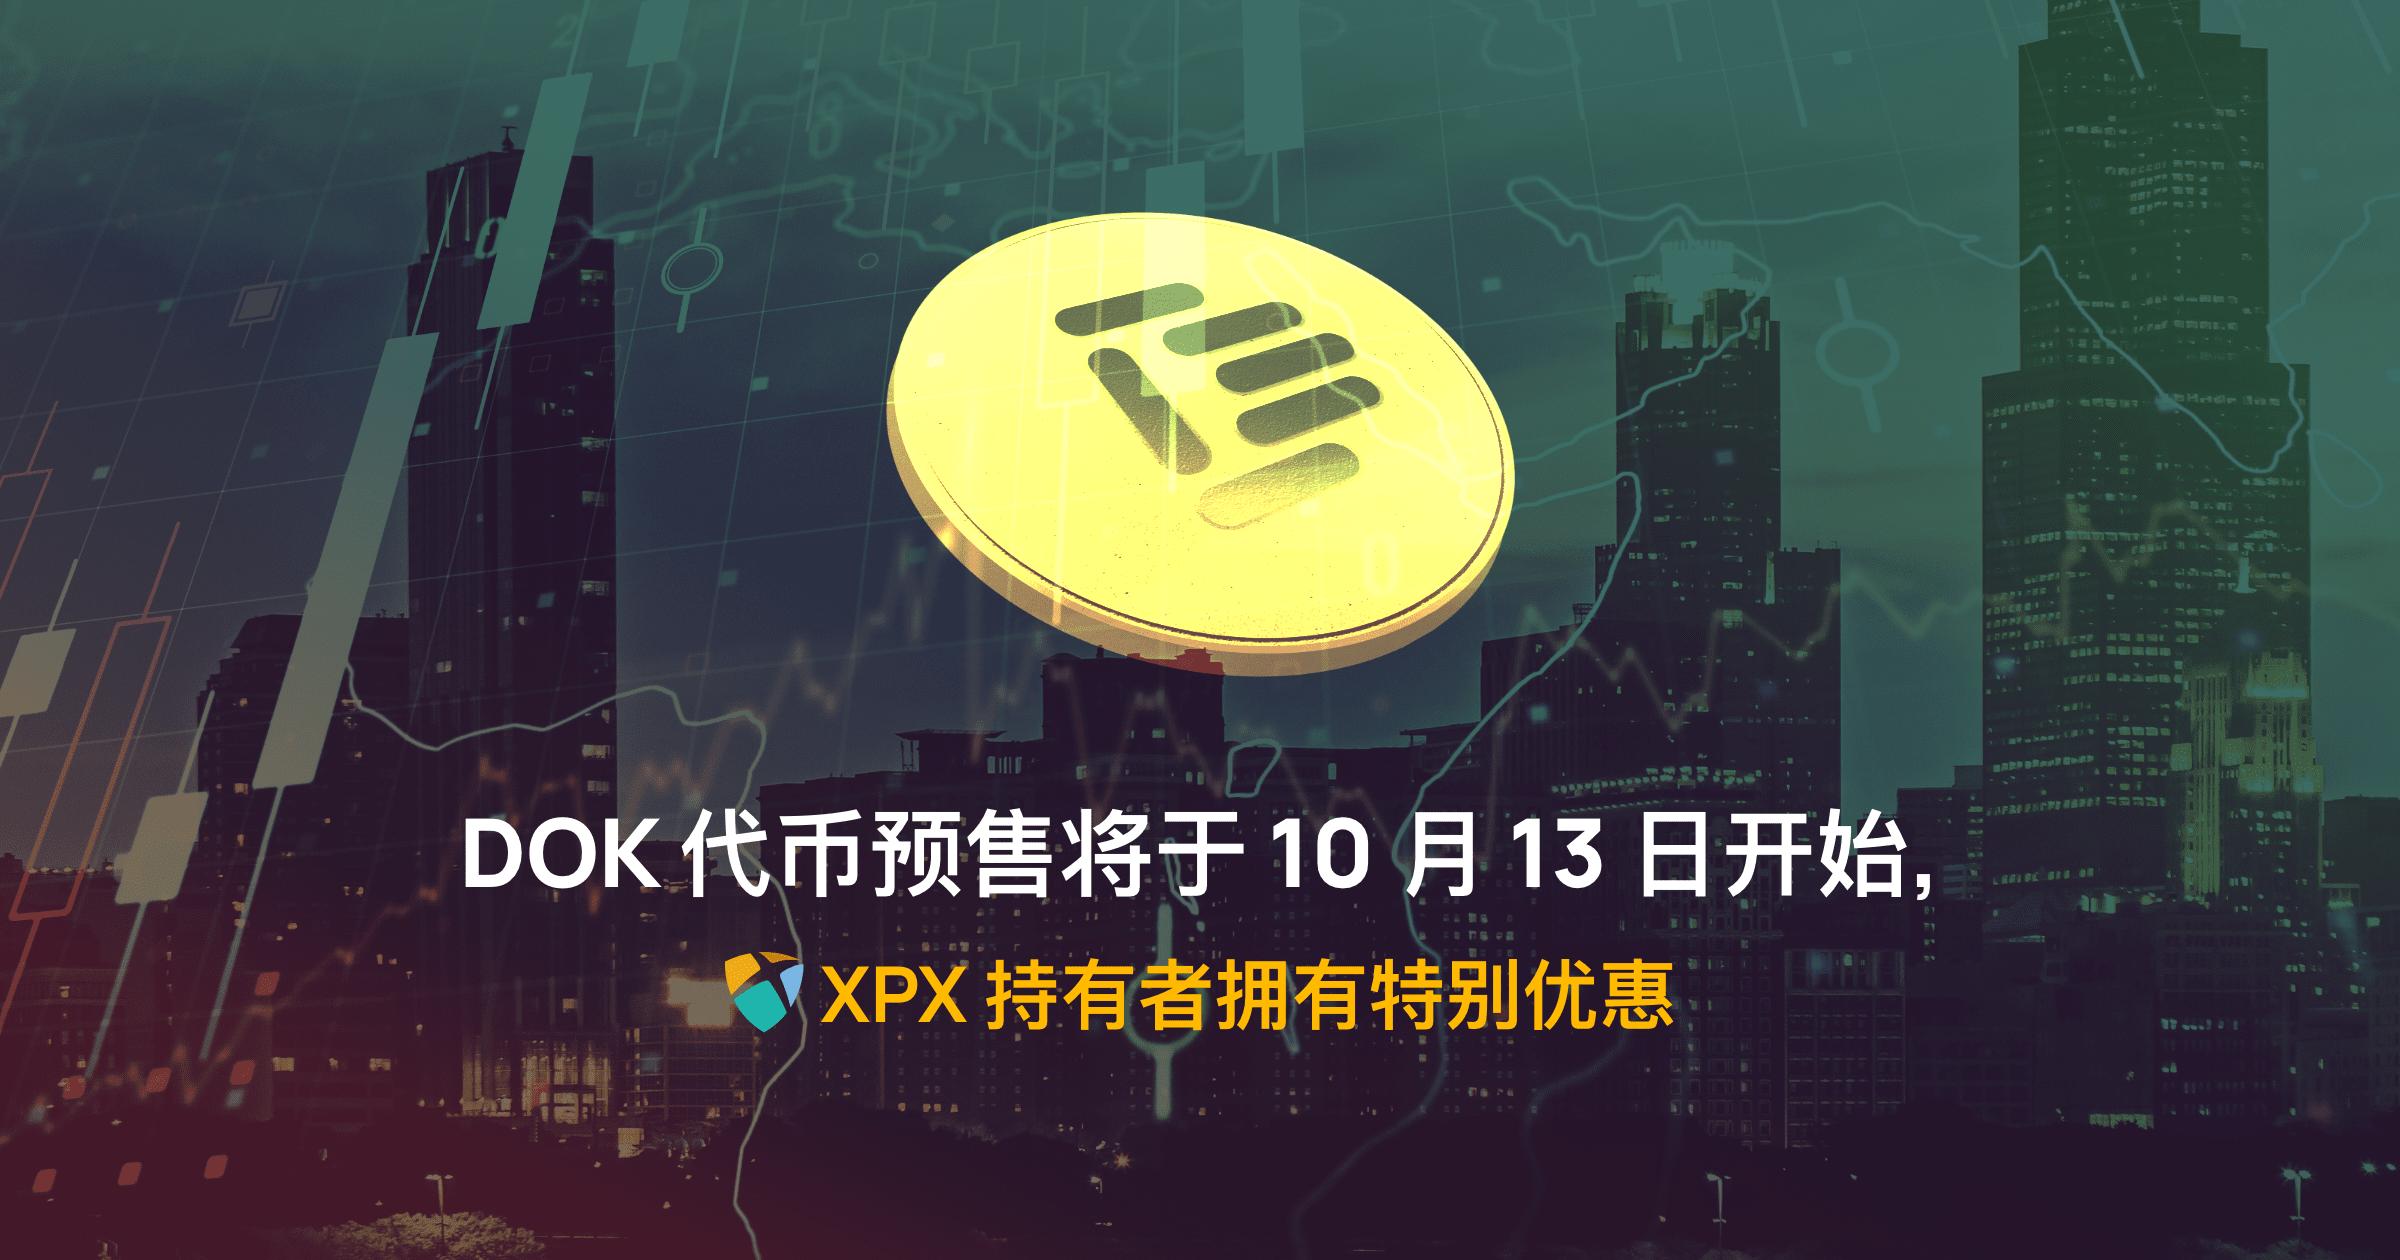 DOK代币预售中为XPX持有者提供特殊奖励!